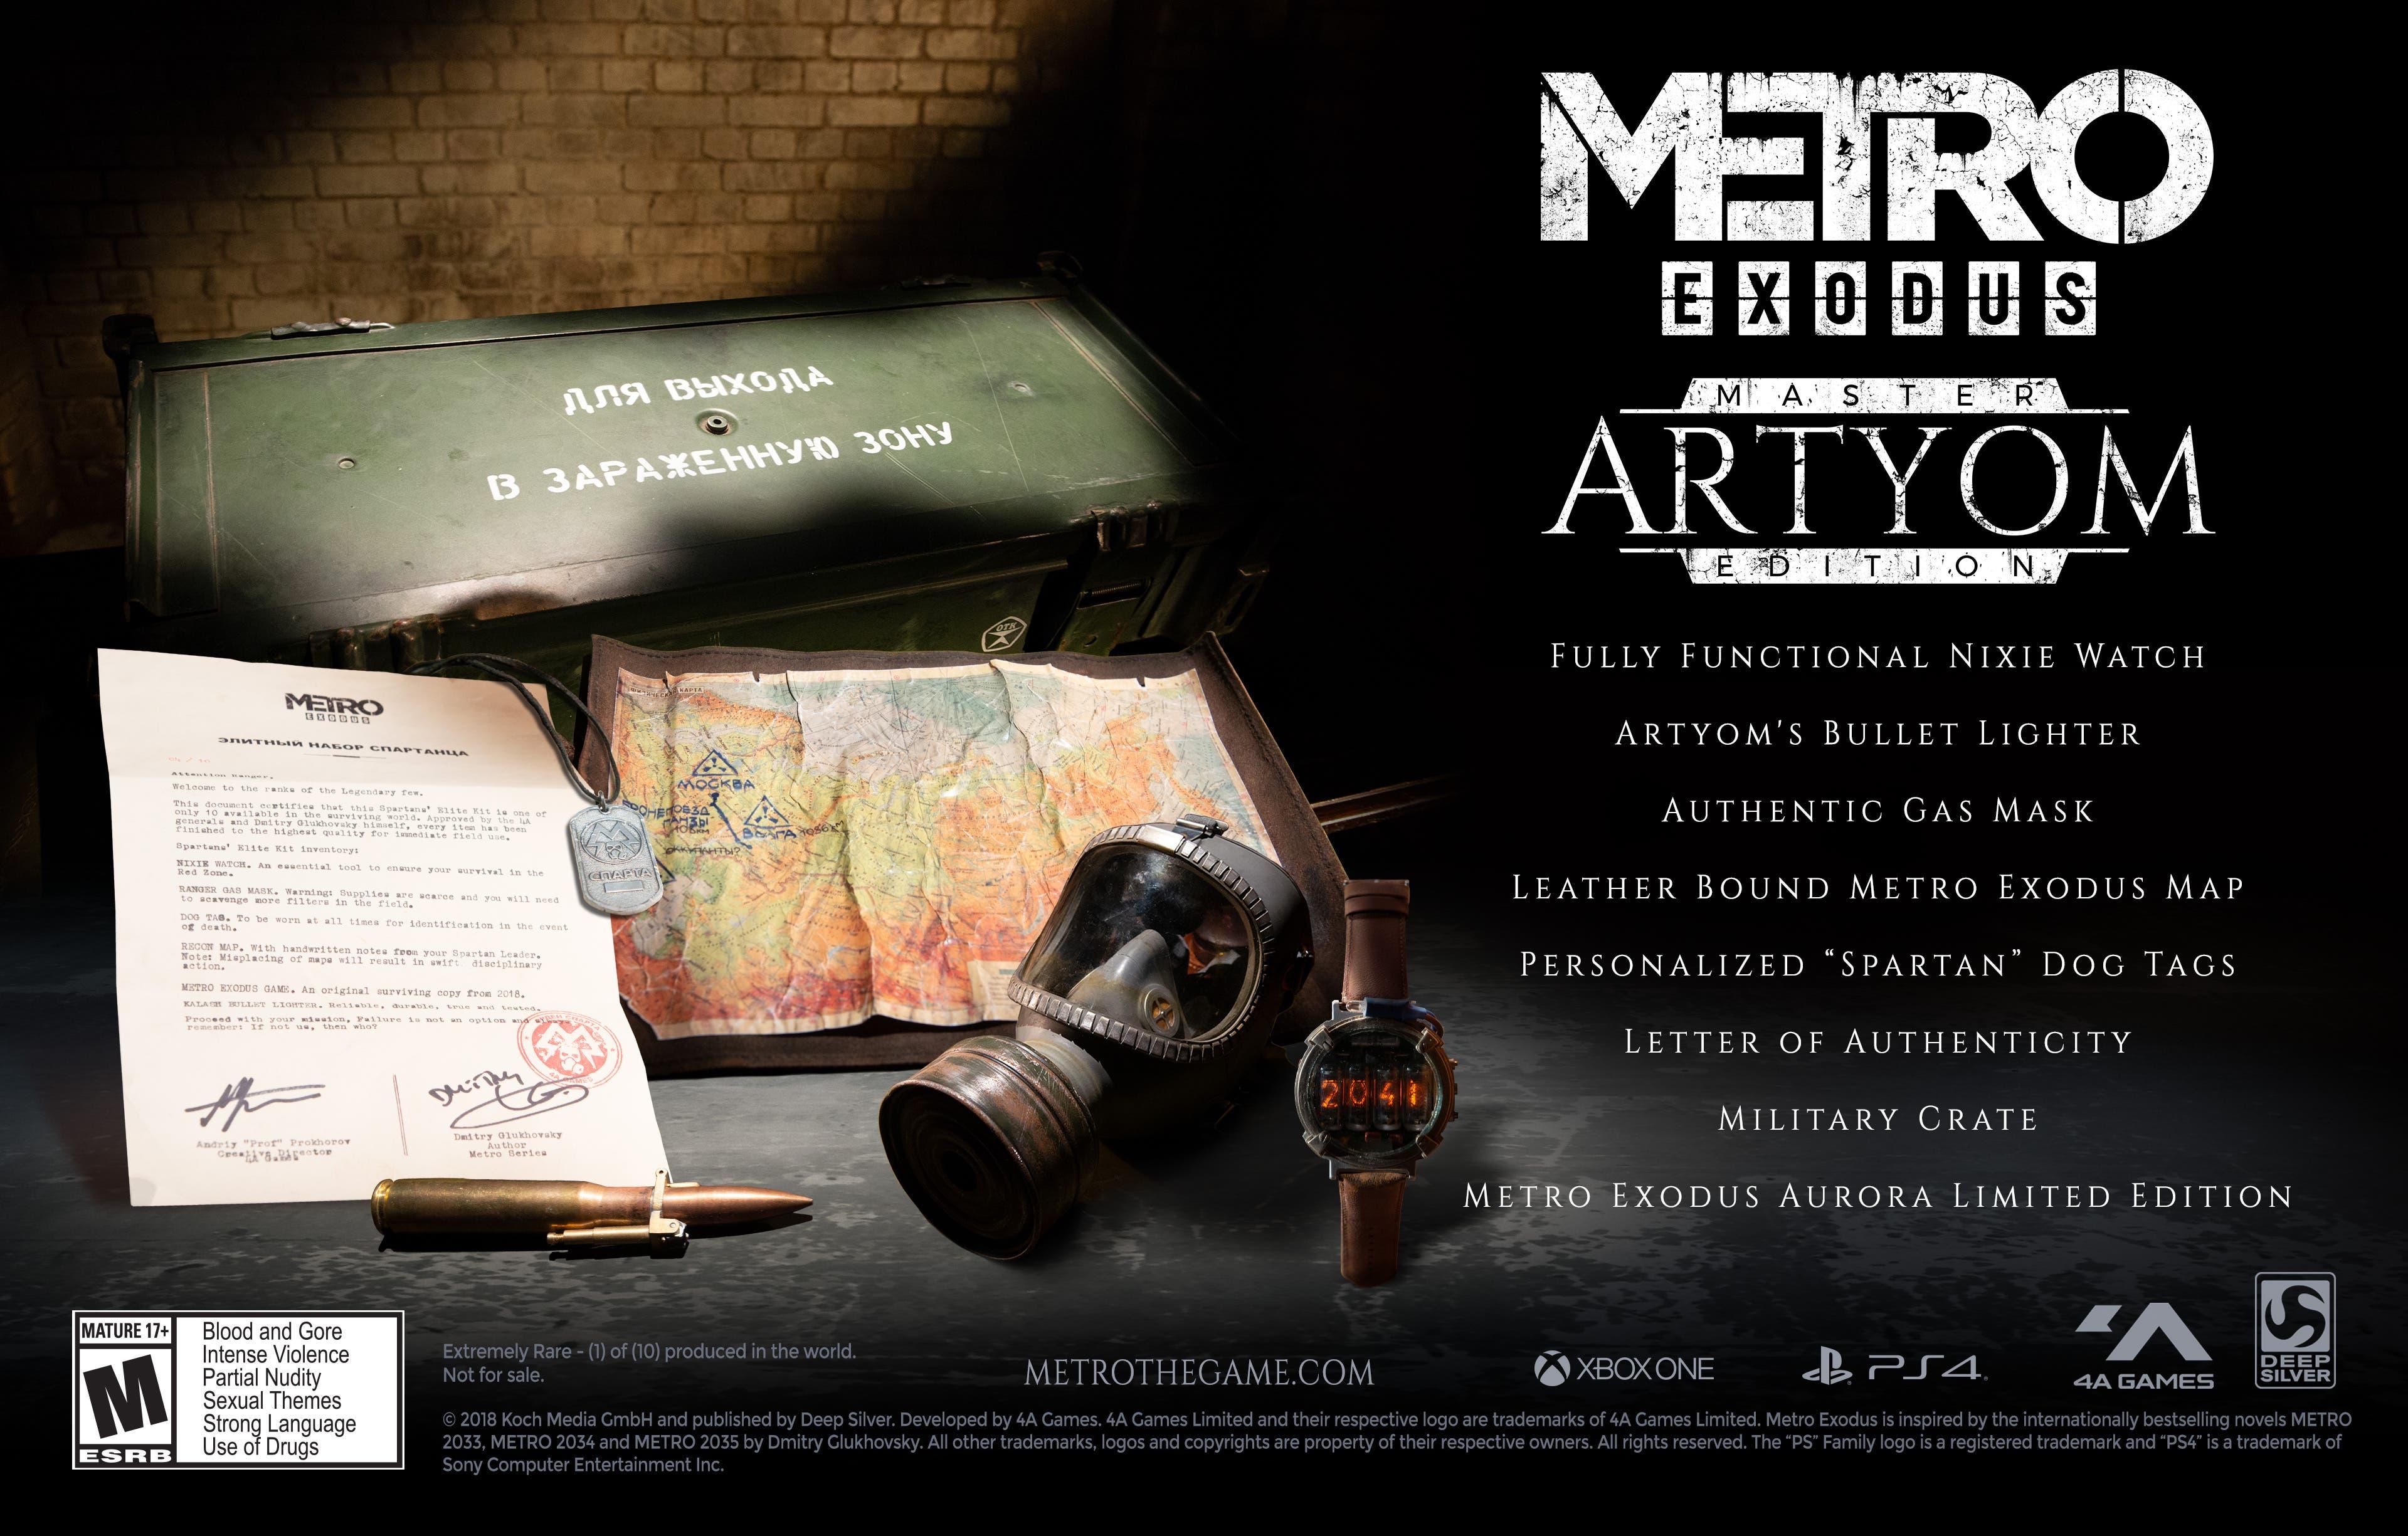 METRO ArtyomEd BEAUTY SHOT US 1 2